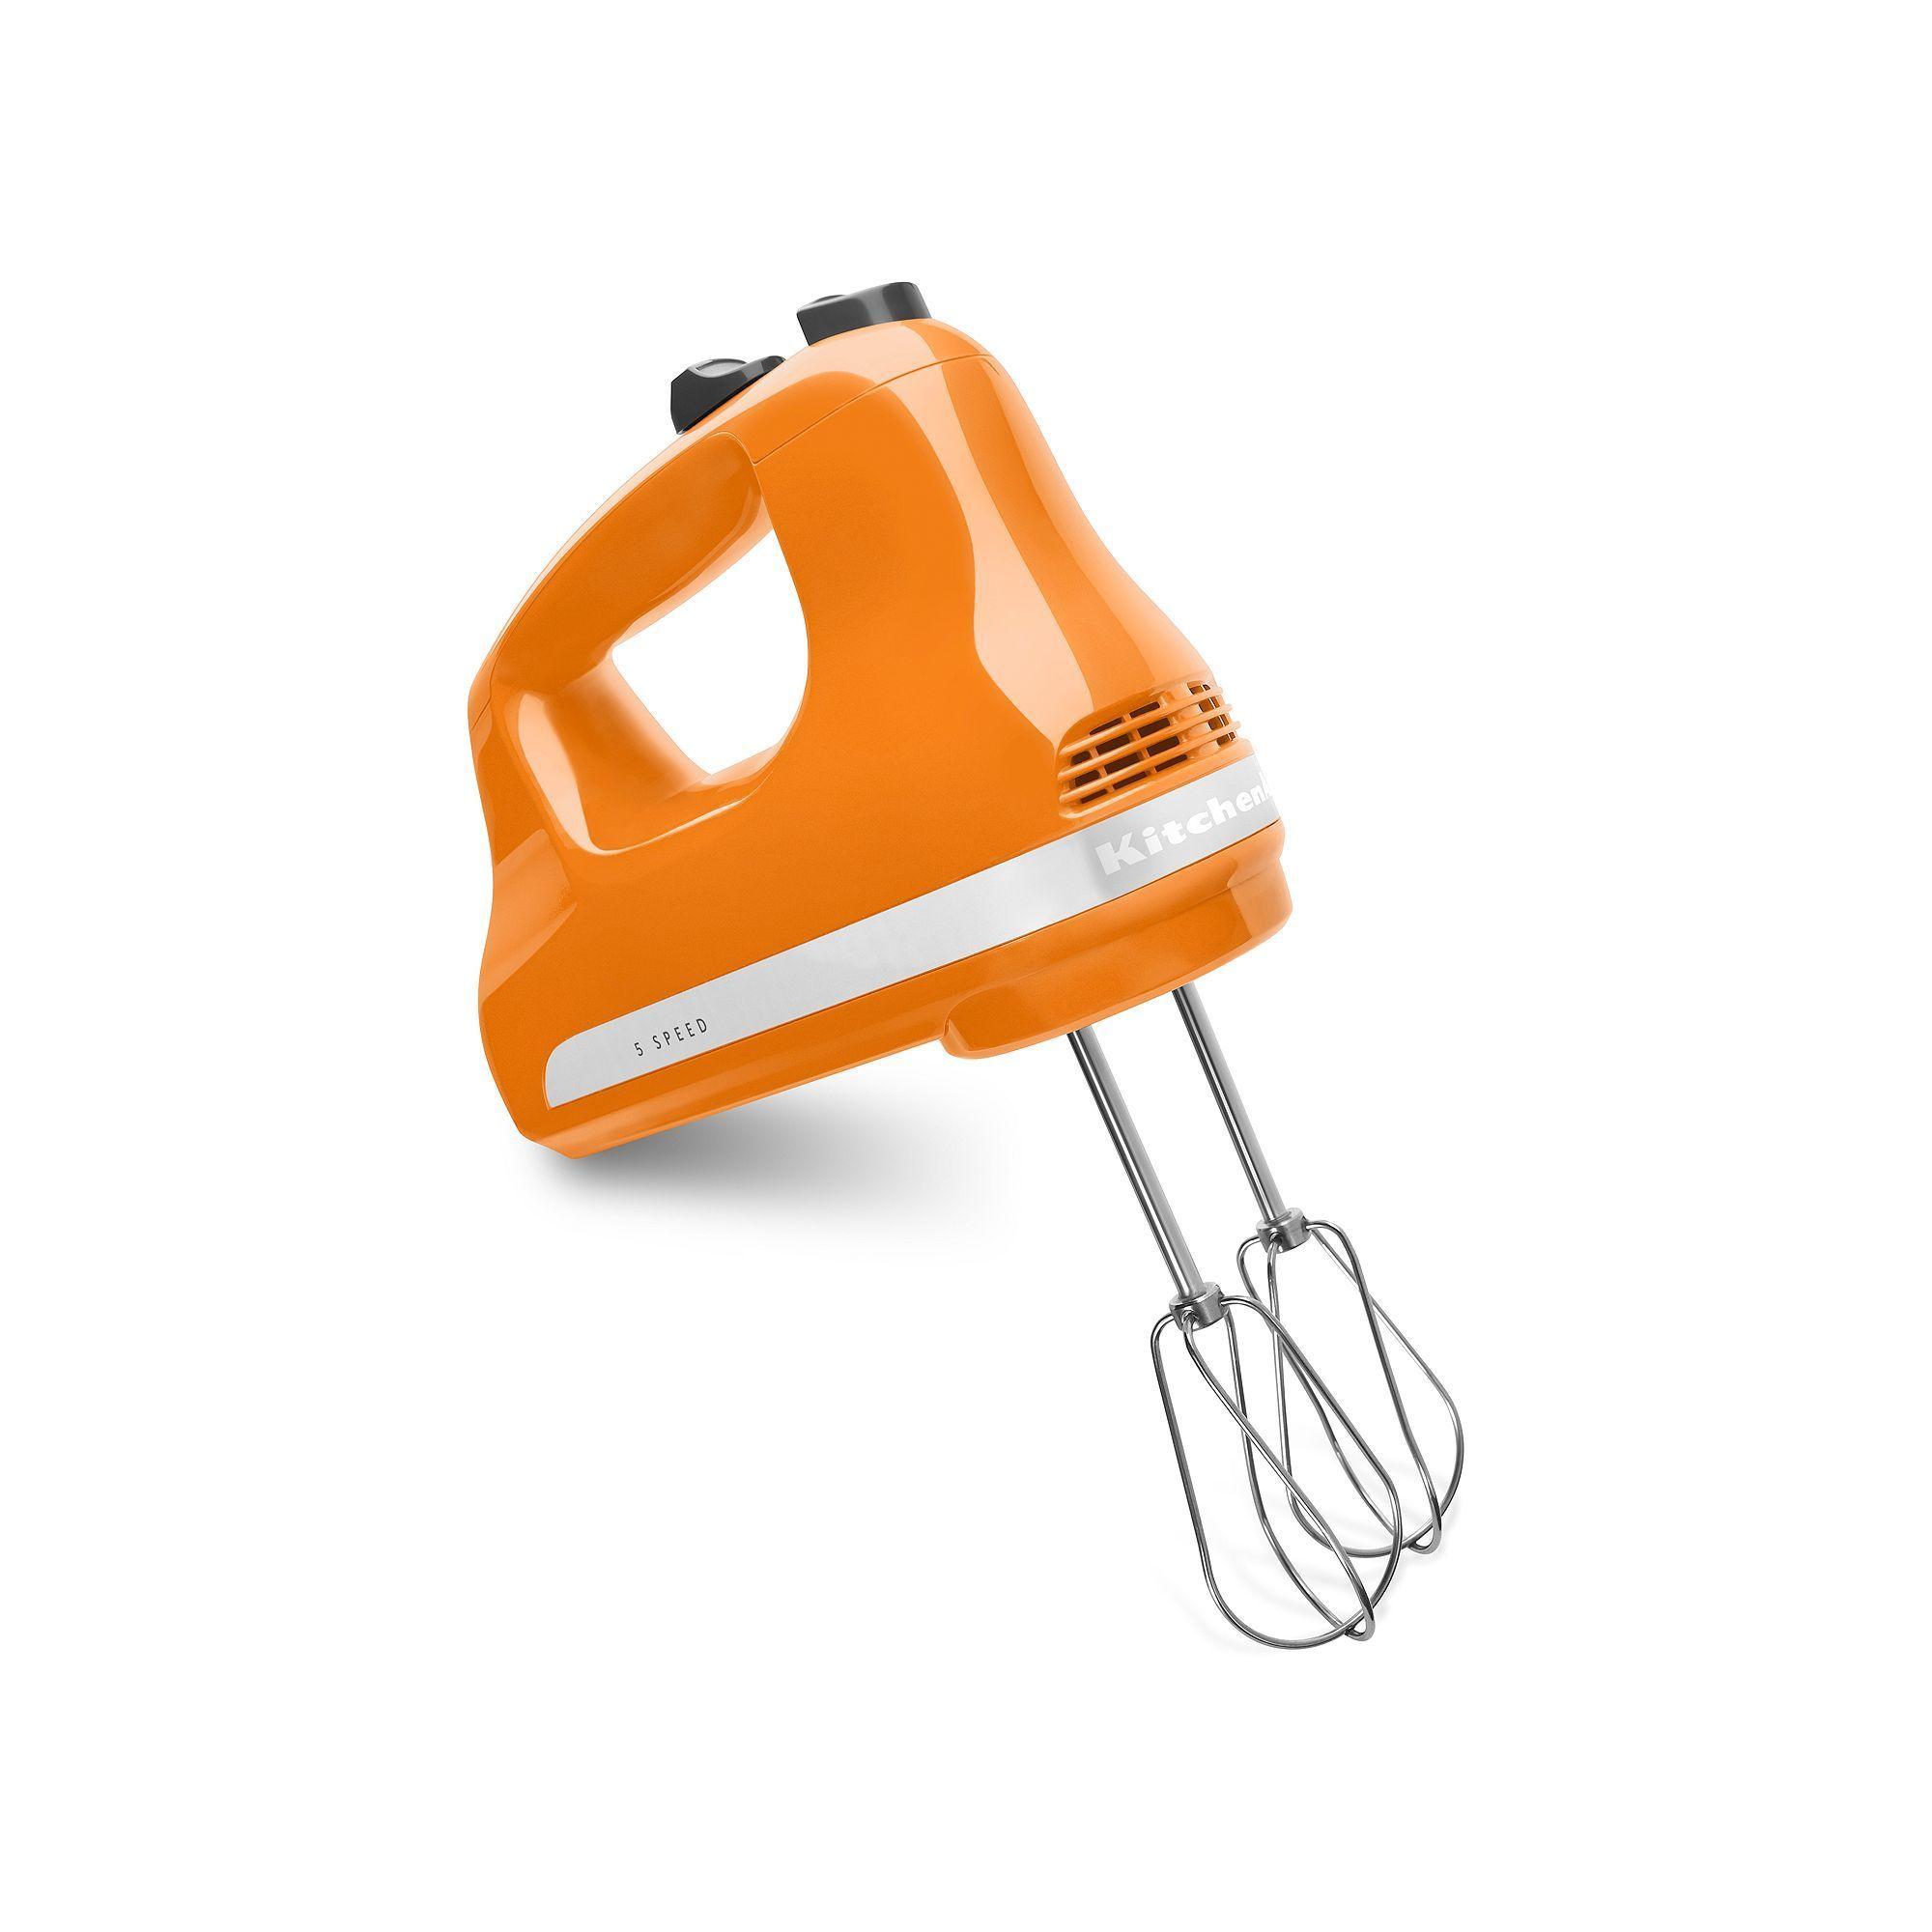 Kitchenaid khm512 5speed ultra power hand mixer hand